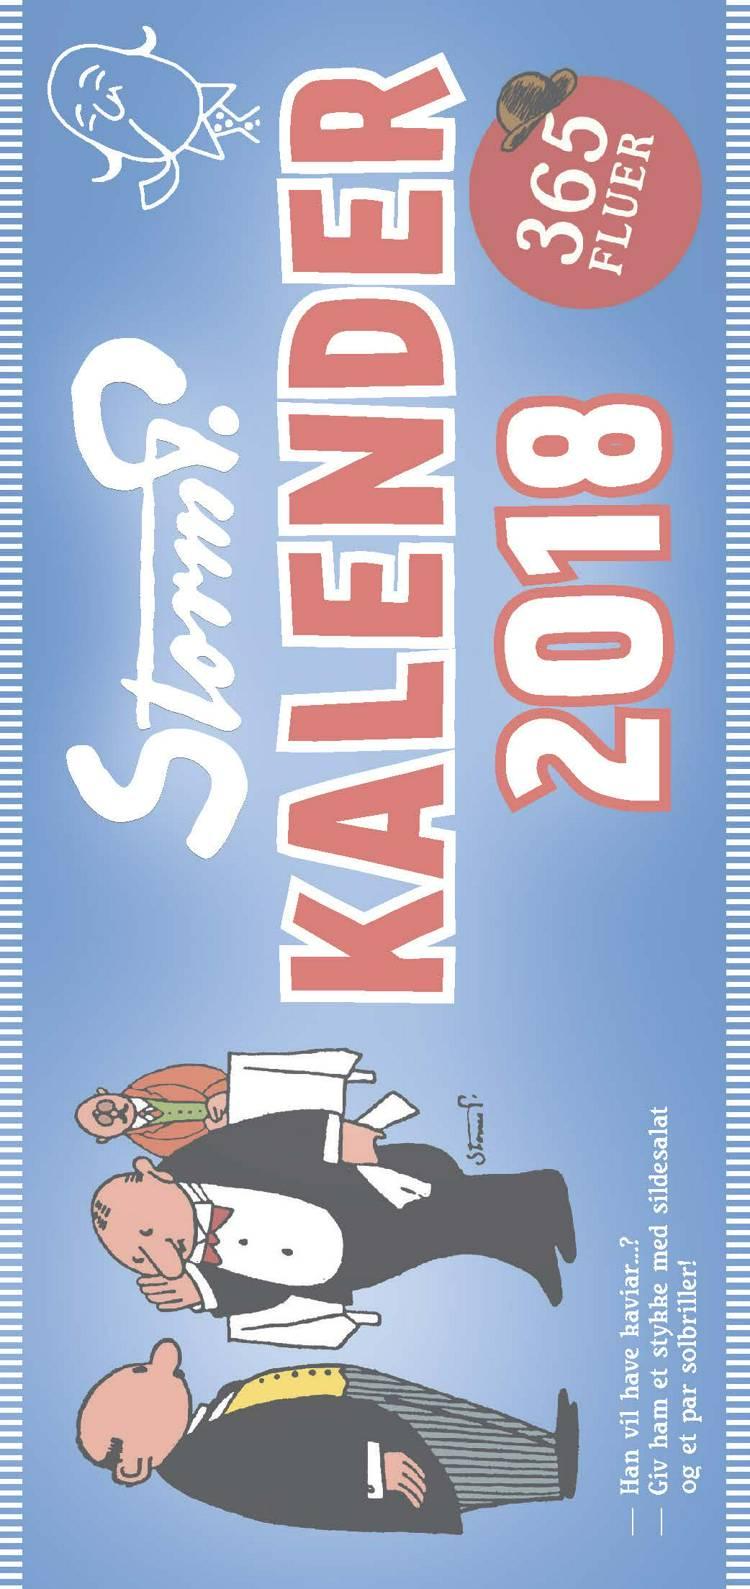 Storm P. kalender 2018 - 366 fluer af Robert Storm Petersen